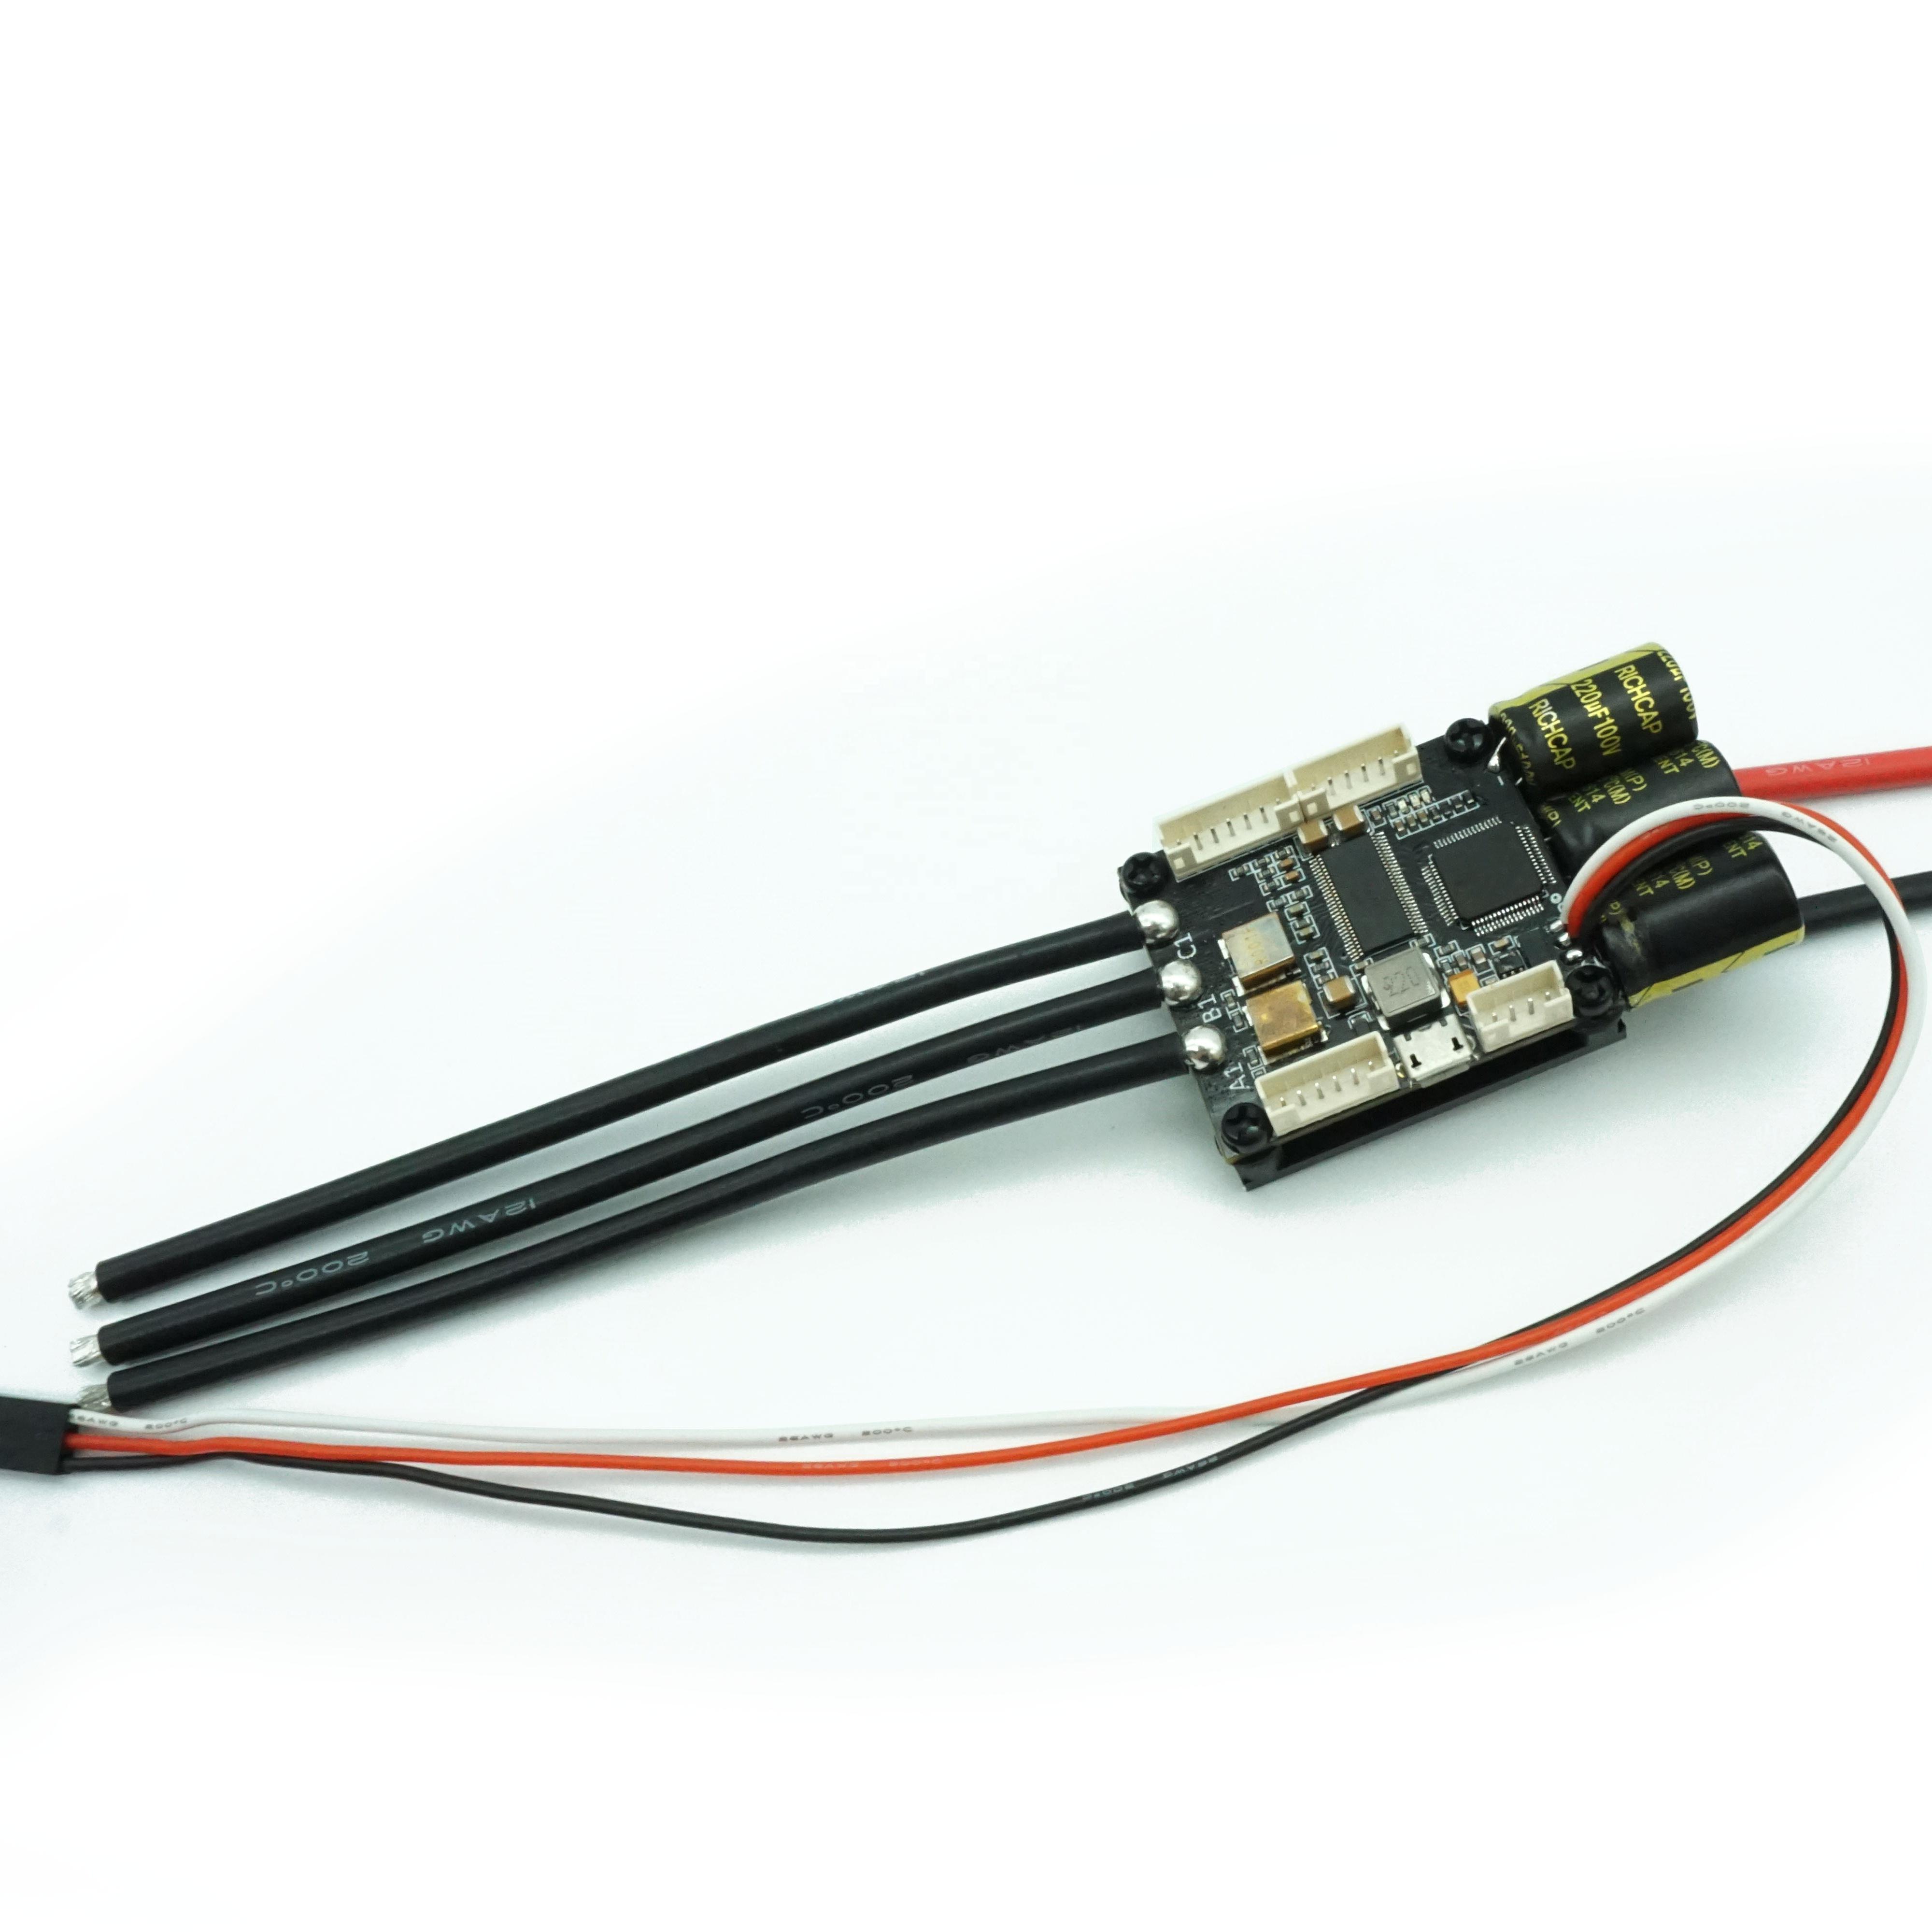 Flipsky ESC4.20 VESC longboard electric controller 50A vesc esc for skateboard